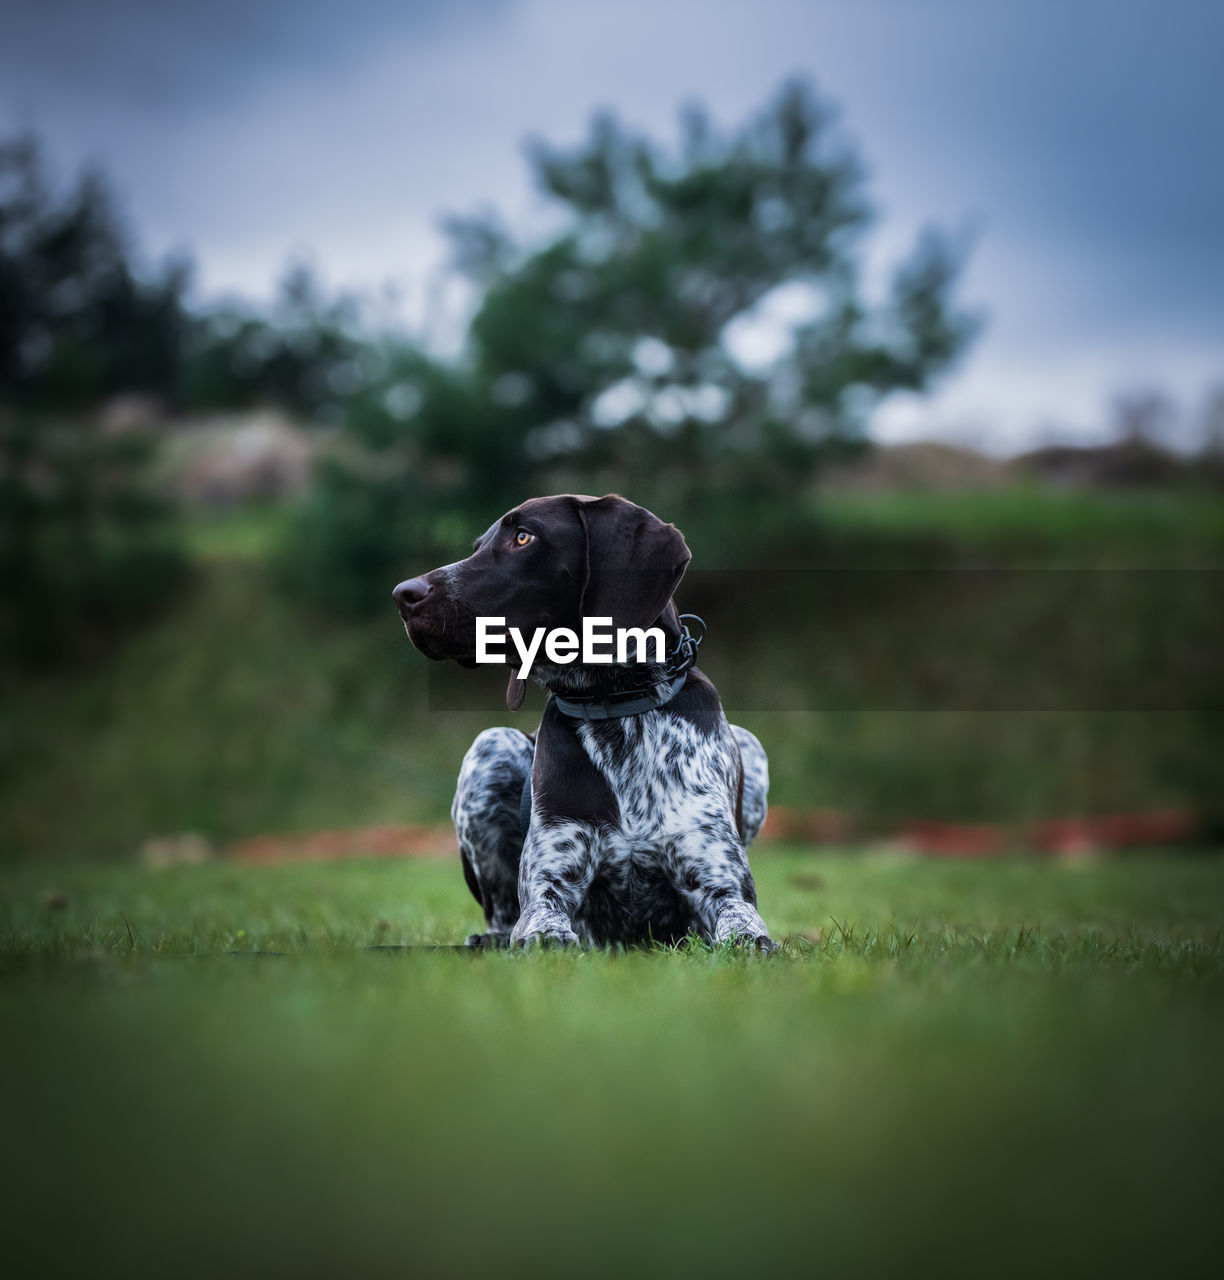 Dog sitting in a field